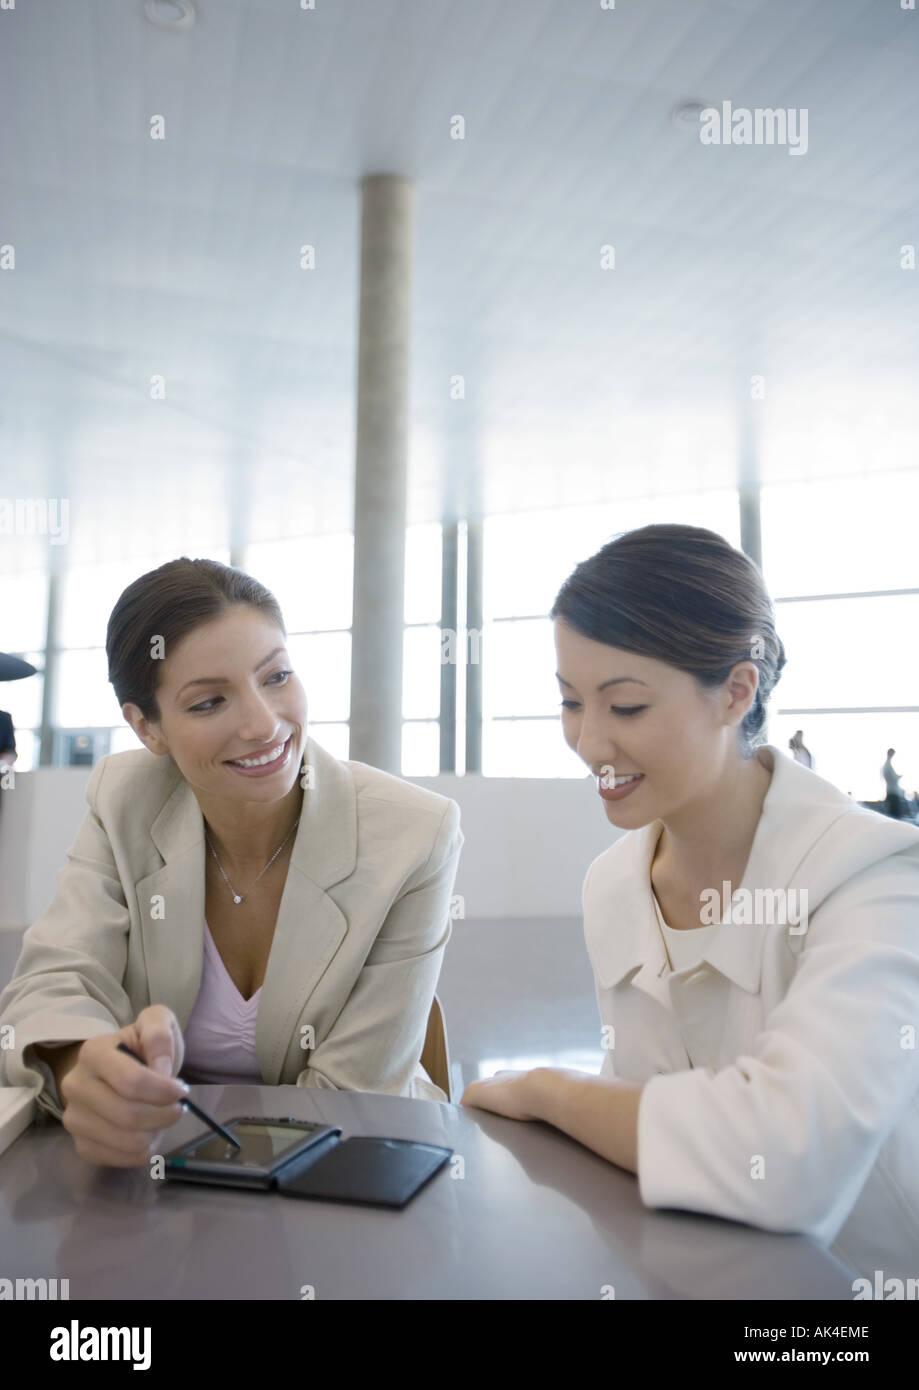 Two businesswomen using electronic organizer - Stock Image